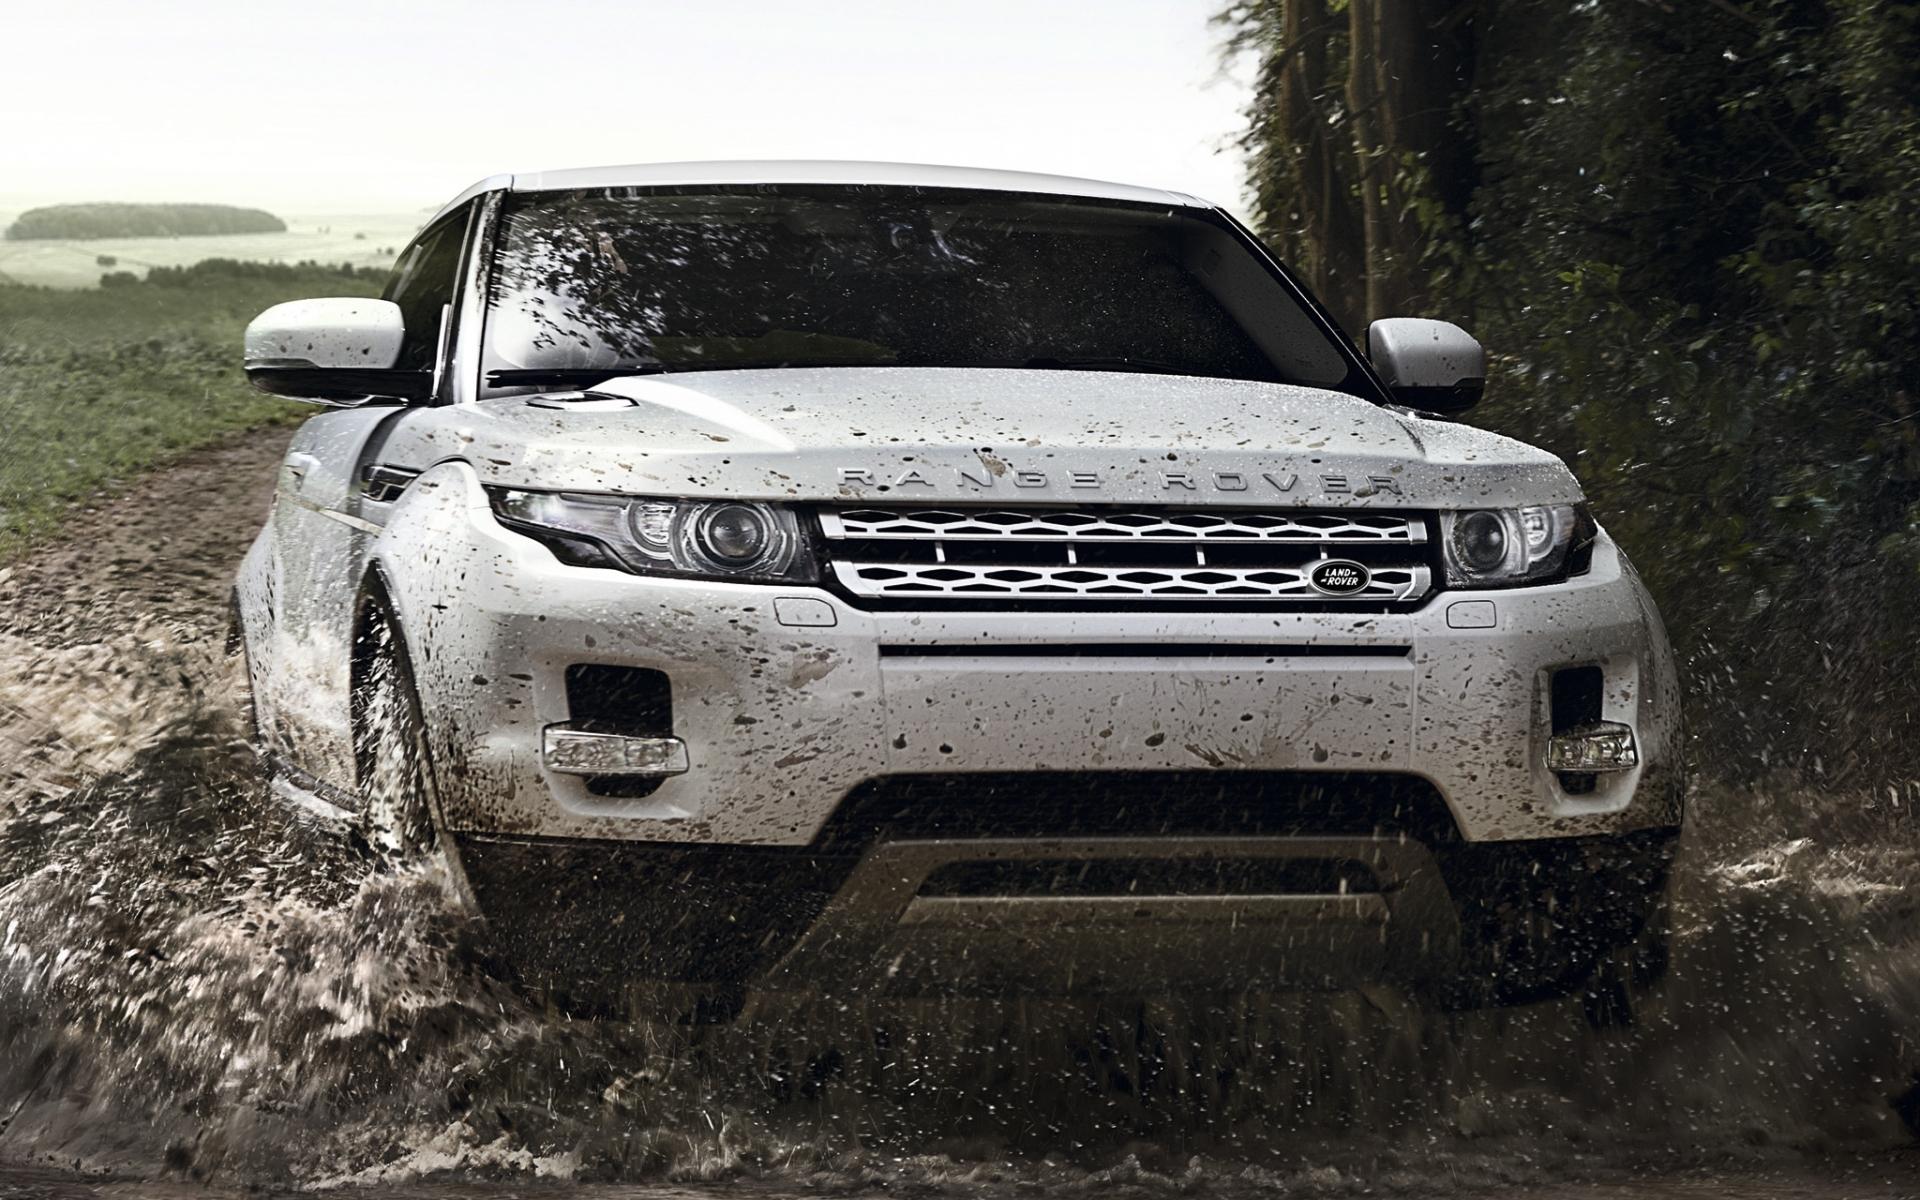 Range Rover Evoque Hd Wallpaper Background Image 1920x1200 Id